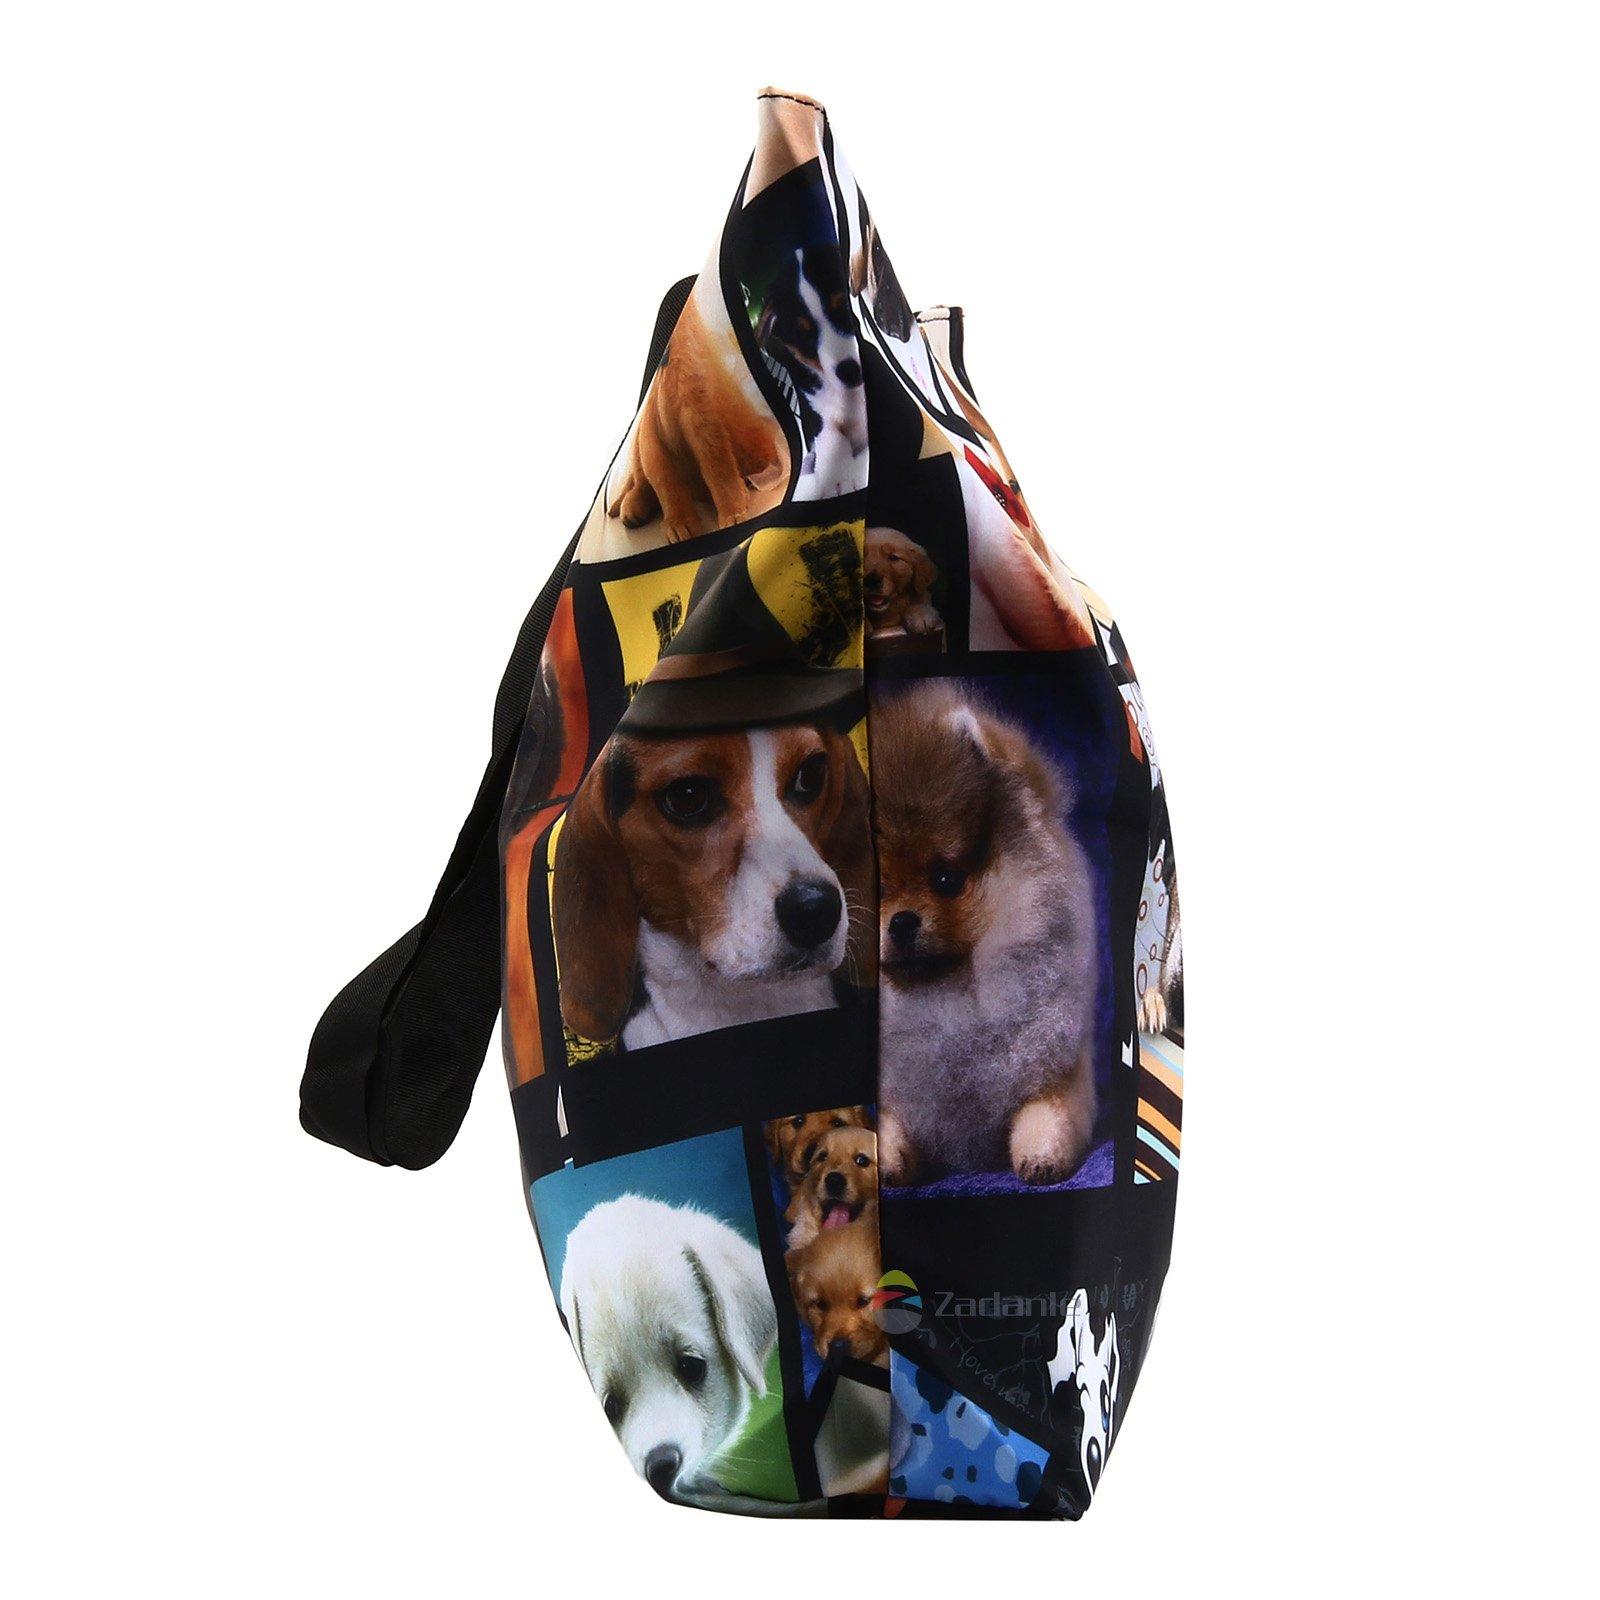 Newplenty Ladies Zippered Light Shoulder Shopping Tote Bag Handbag Beach Satchel, Many Dogs by newplenty (Image #4)